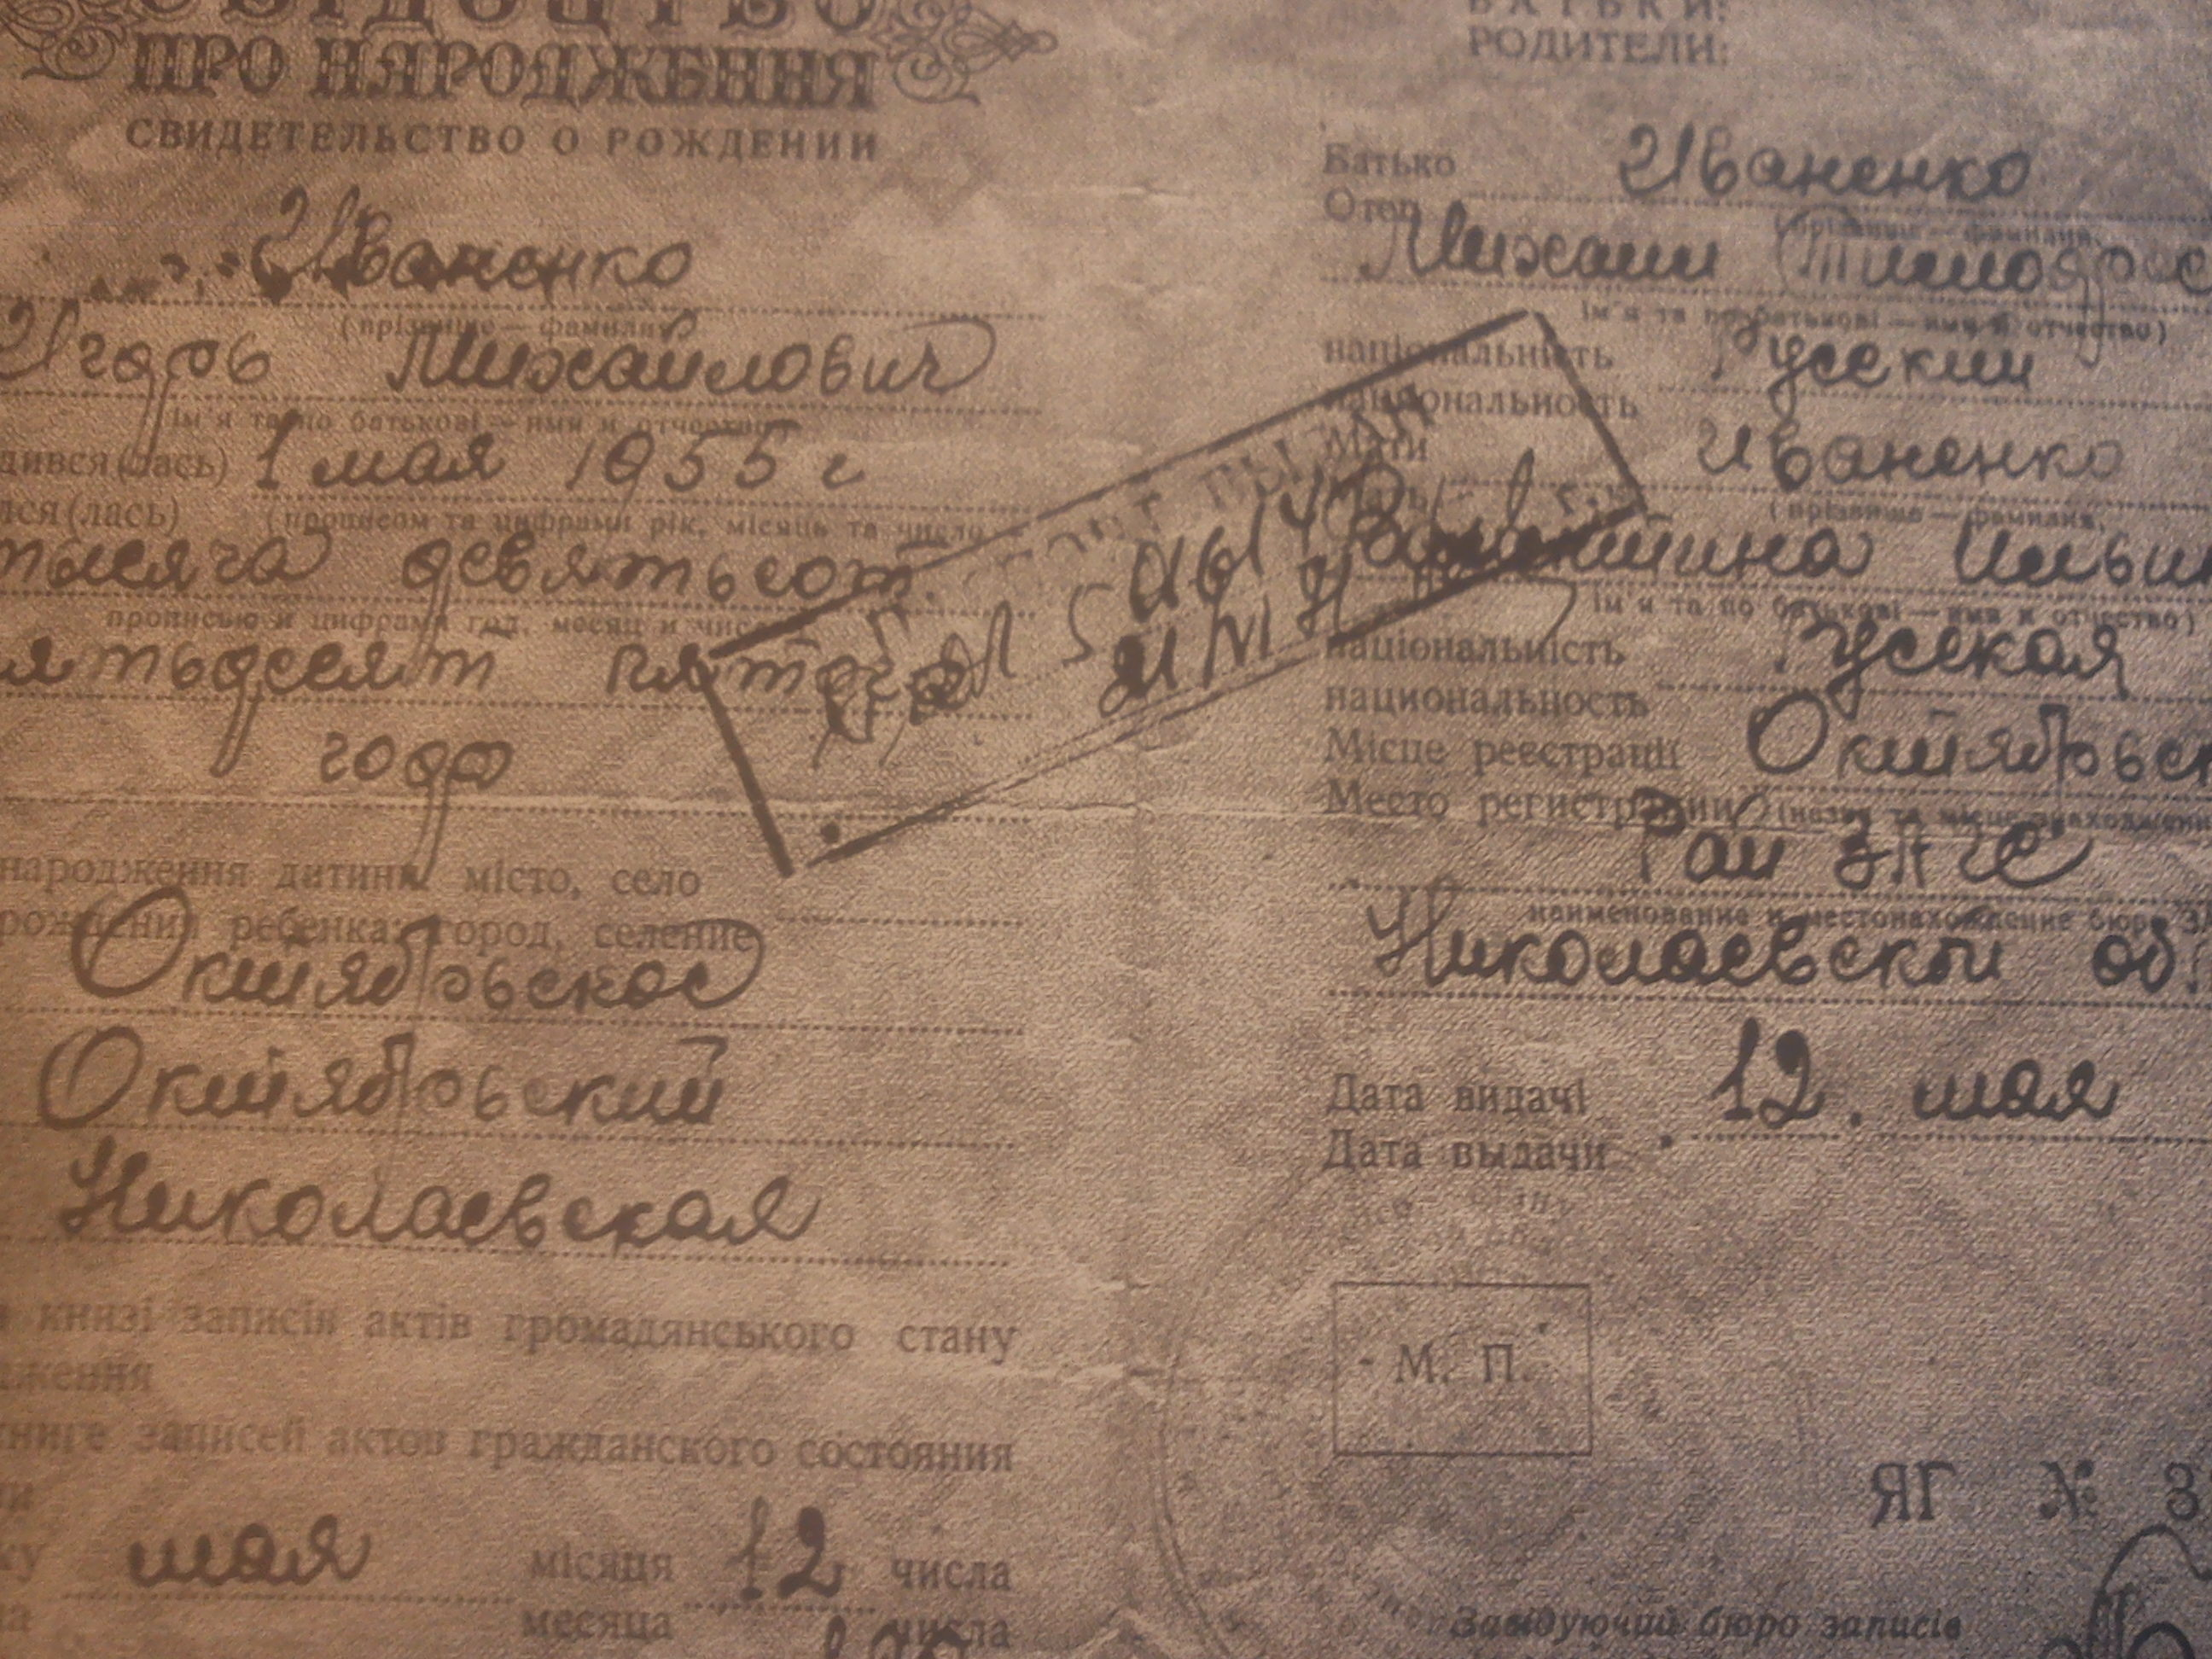 Filesoviet birth certificate 1955 ukraineg wikimedia commons filesoviet birth certificate 1955 ukraineg xflitez Gallery